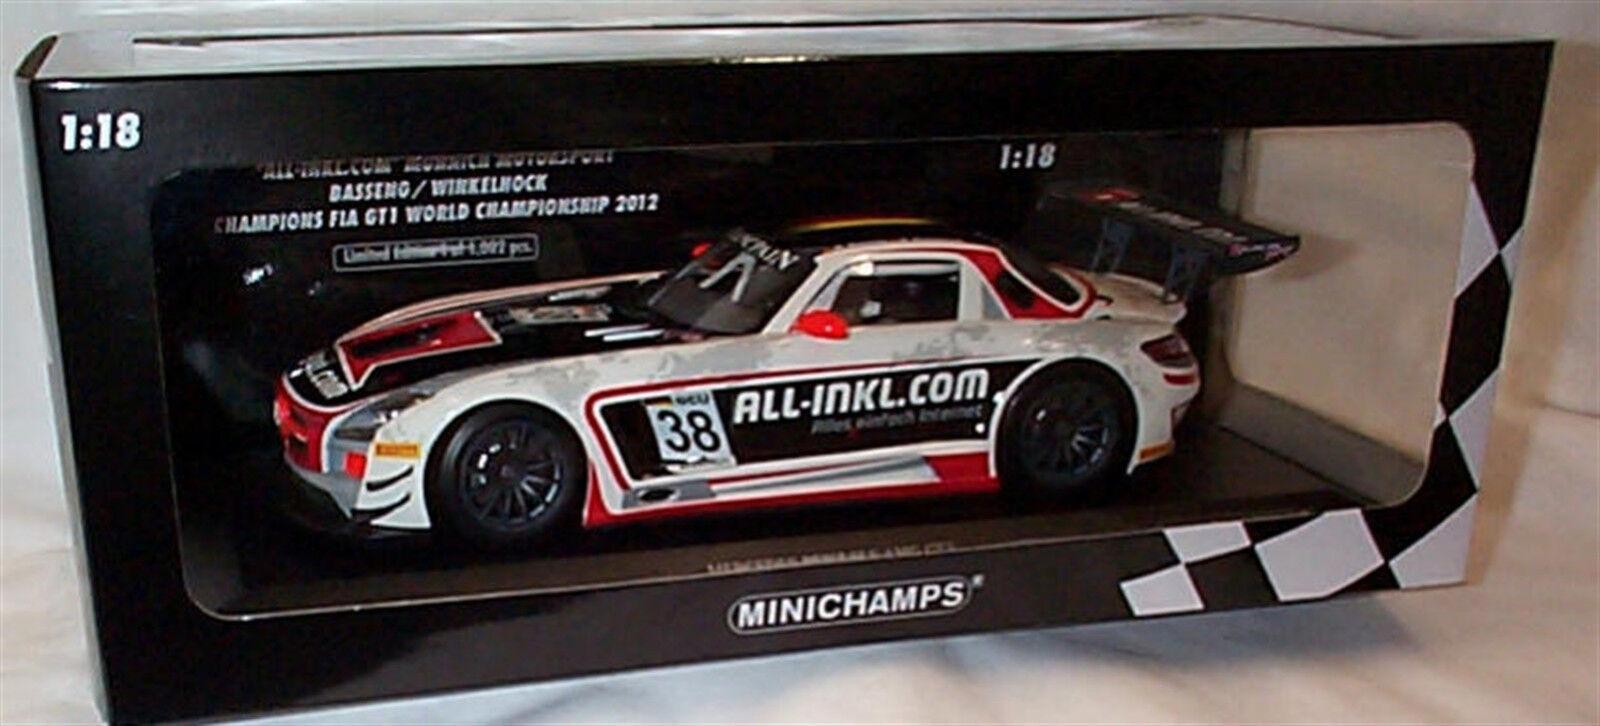 Mercedes Benz SLS AMG GT3 All-Inkl,com Champions Fia GT1 2012 1-18 New in Box